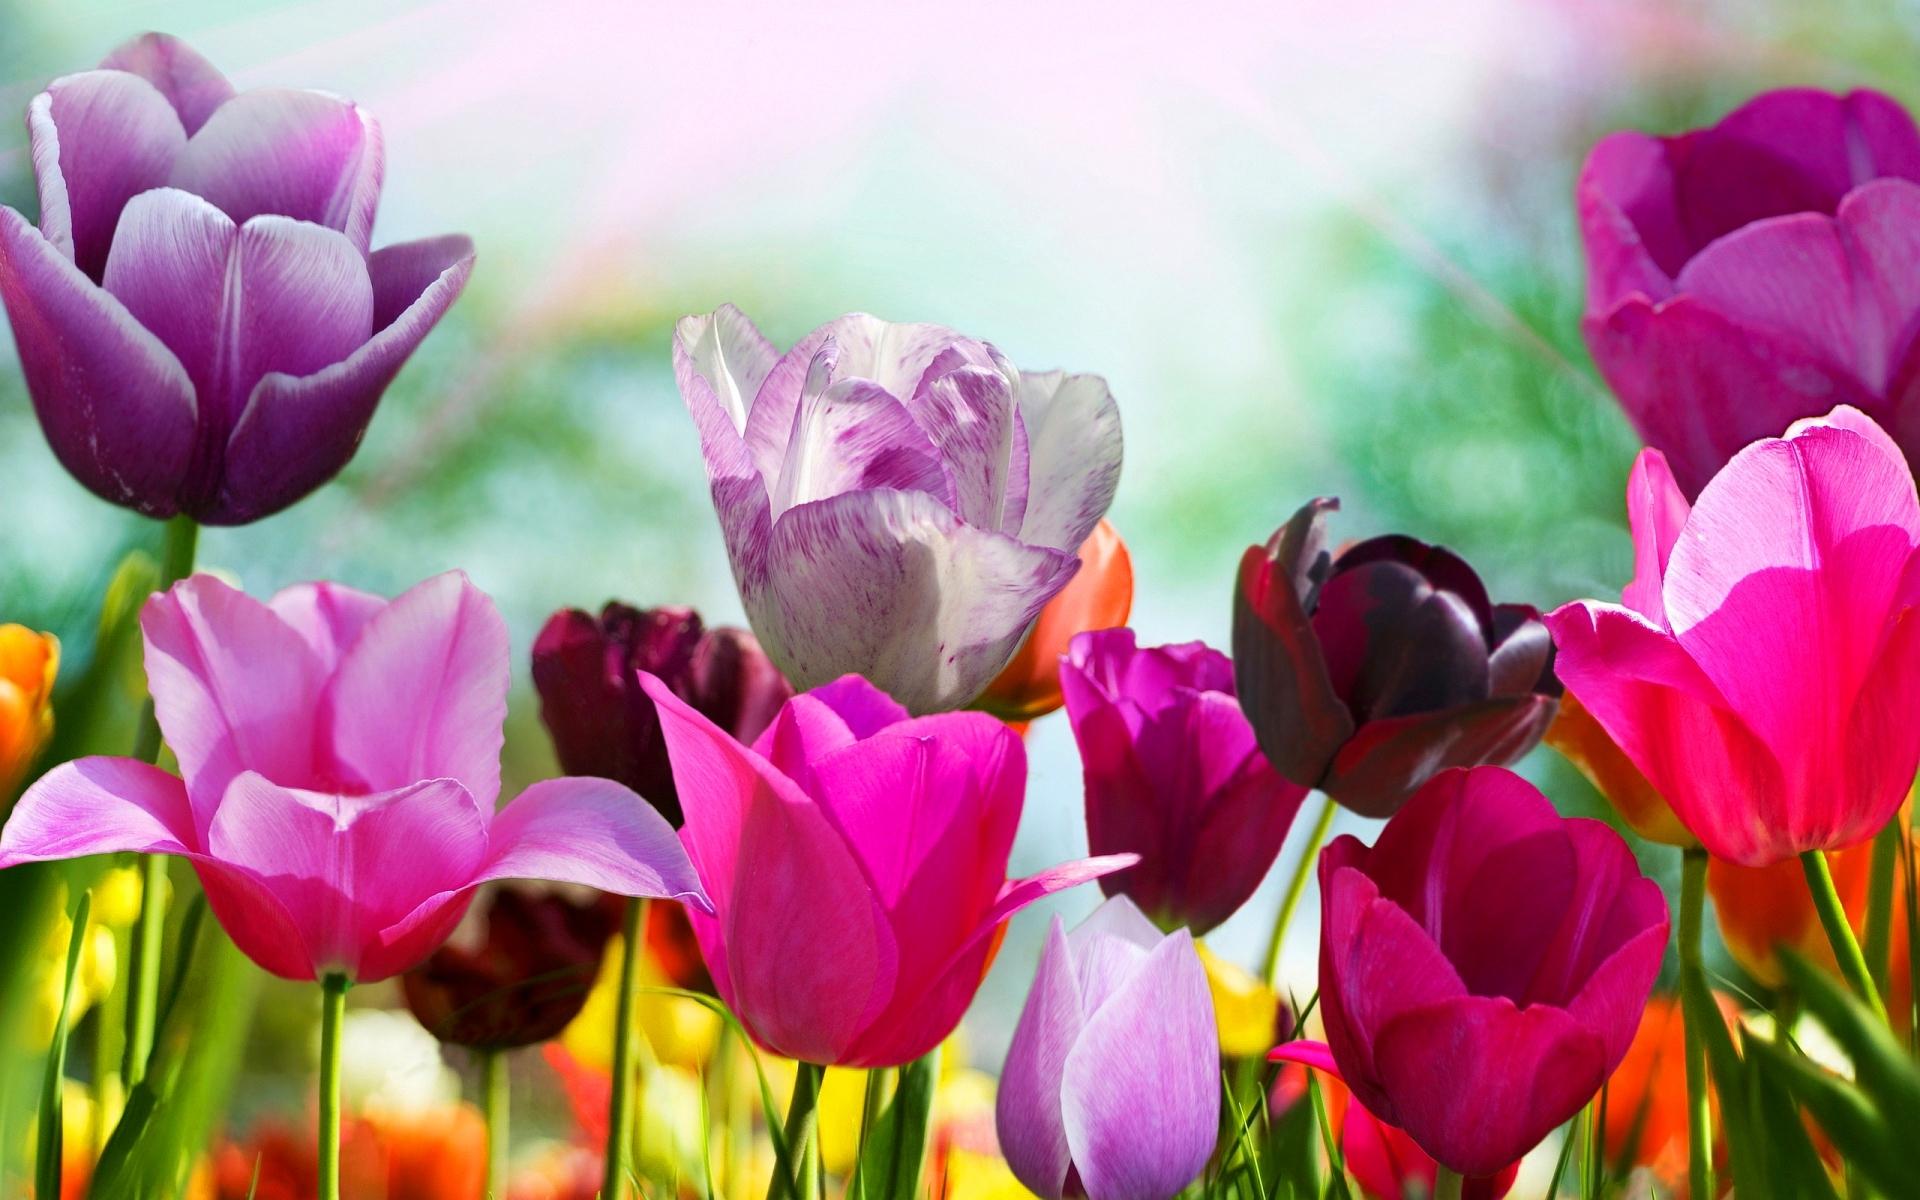 spring screensavers hd 21552 1920x1200 px ~ hdwallsource